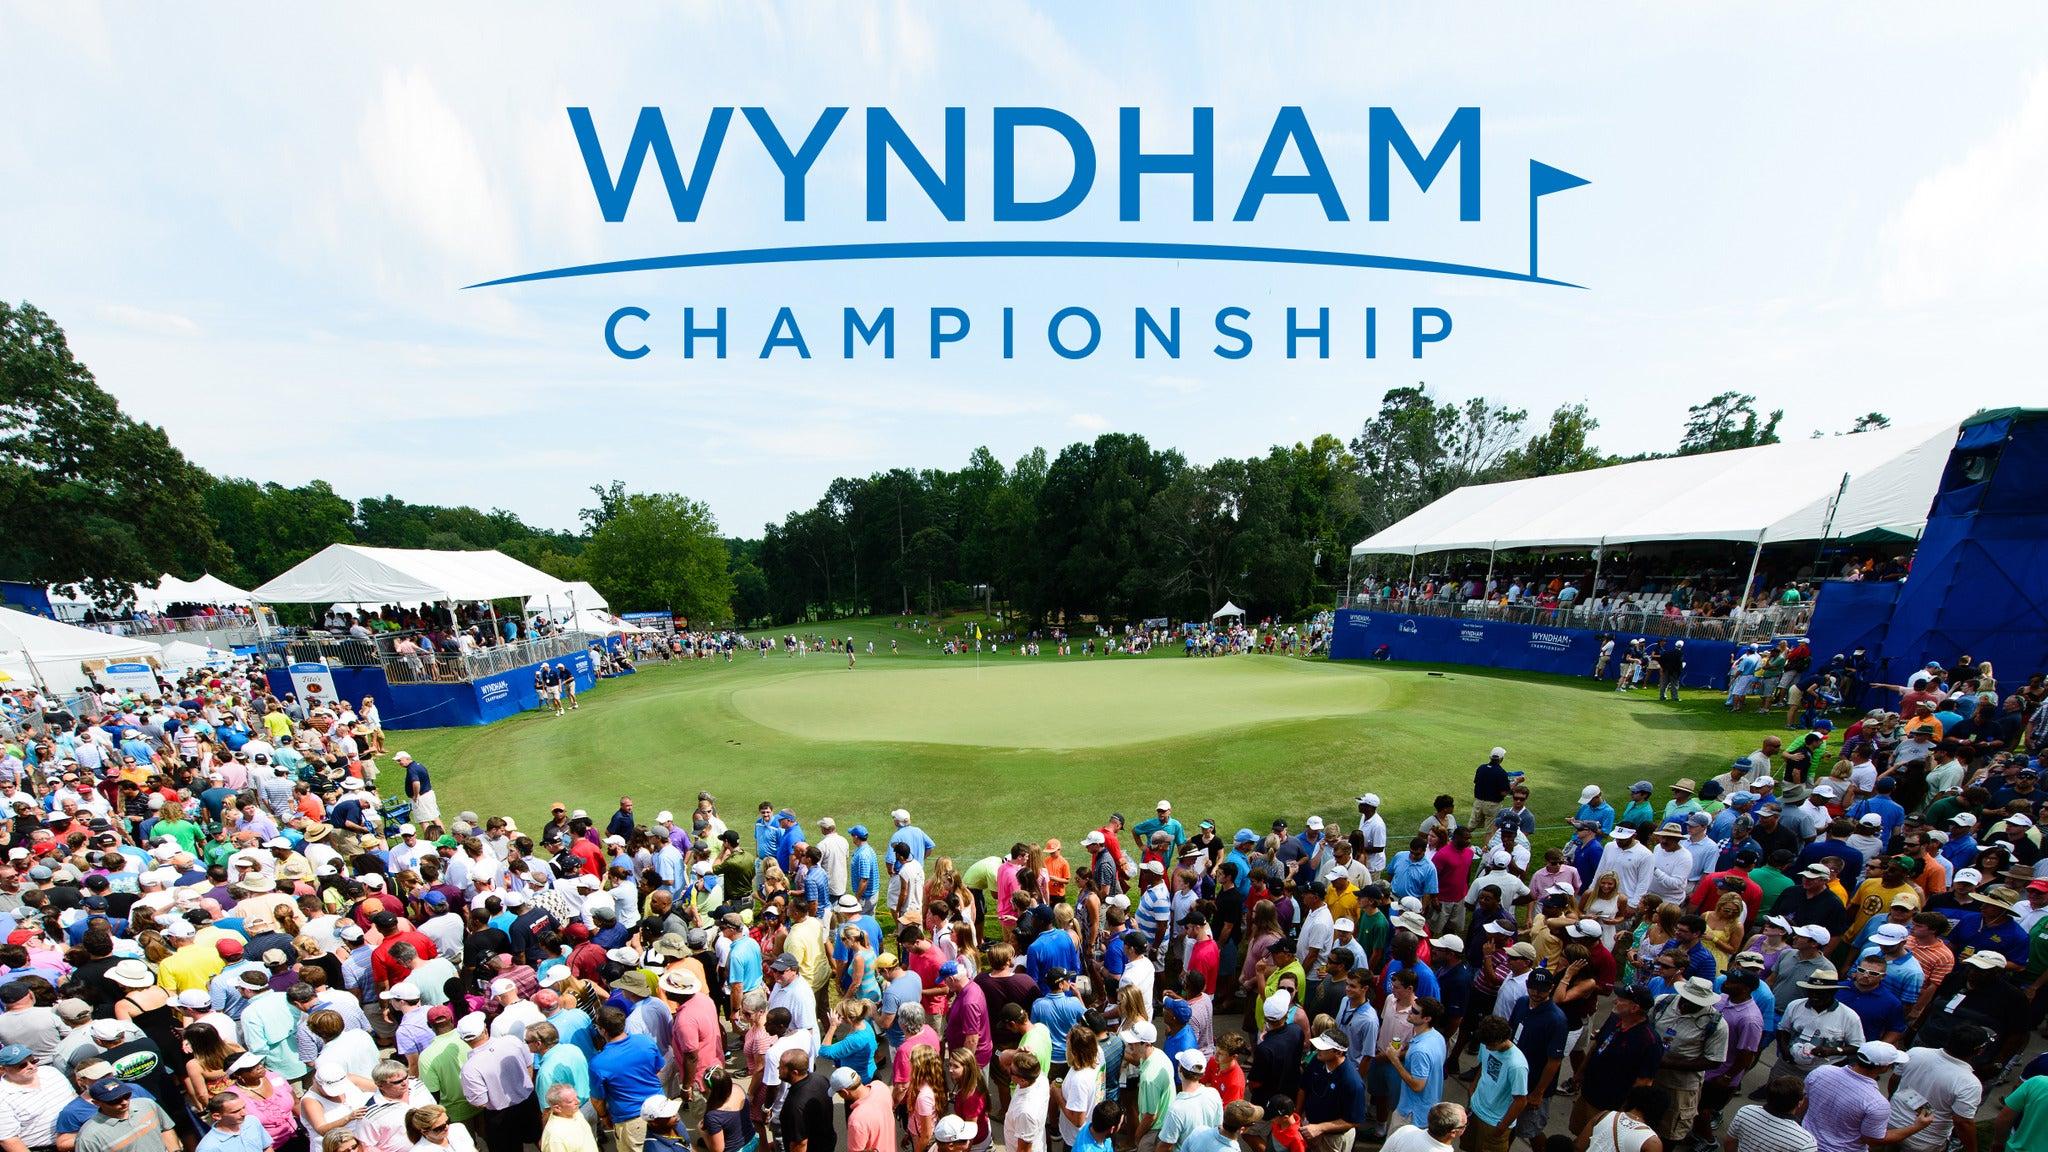 Wyndham Championship: Tuesday Admission